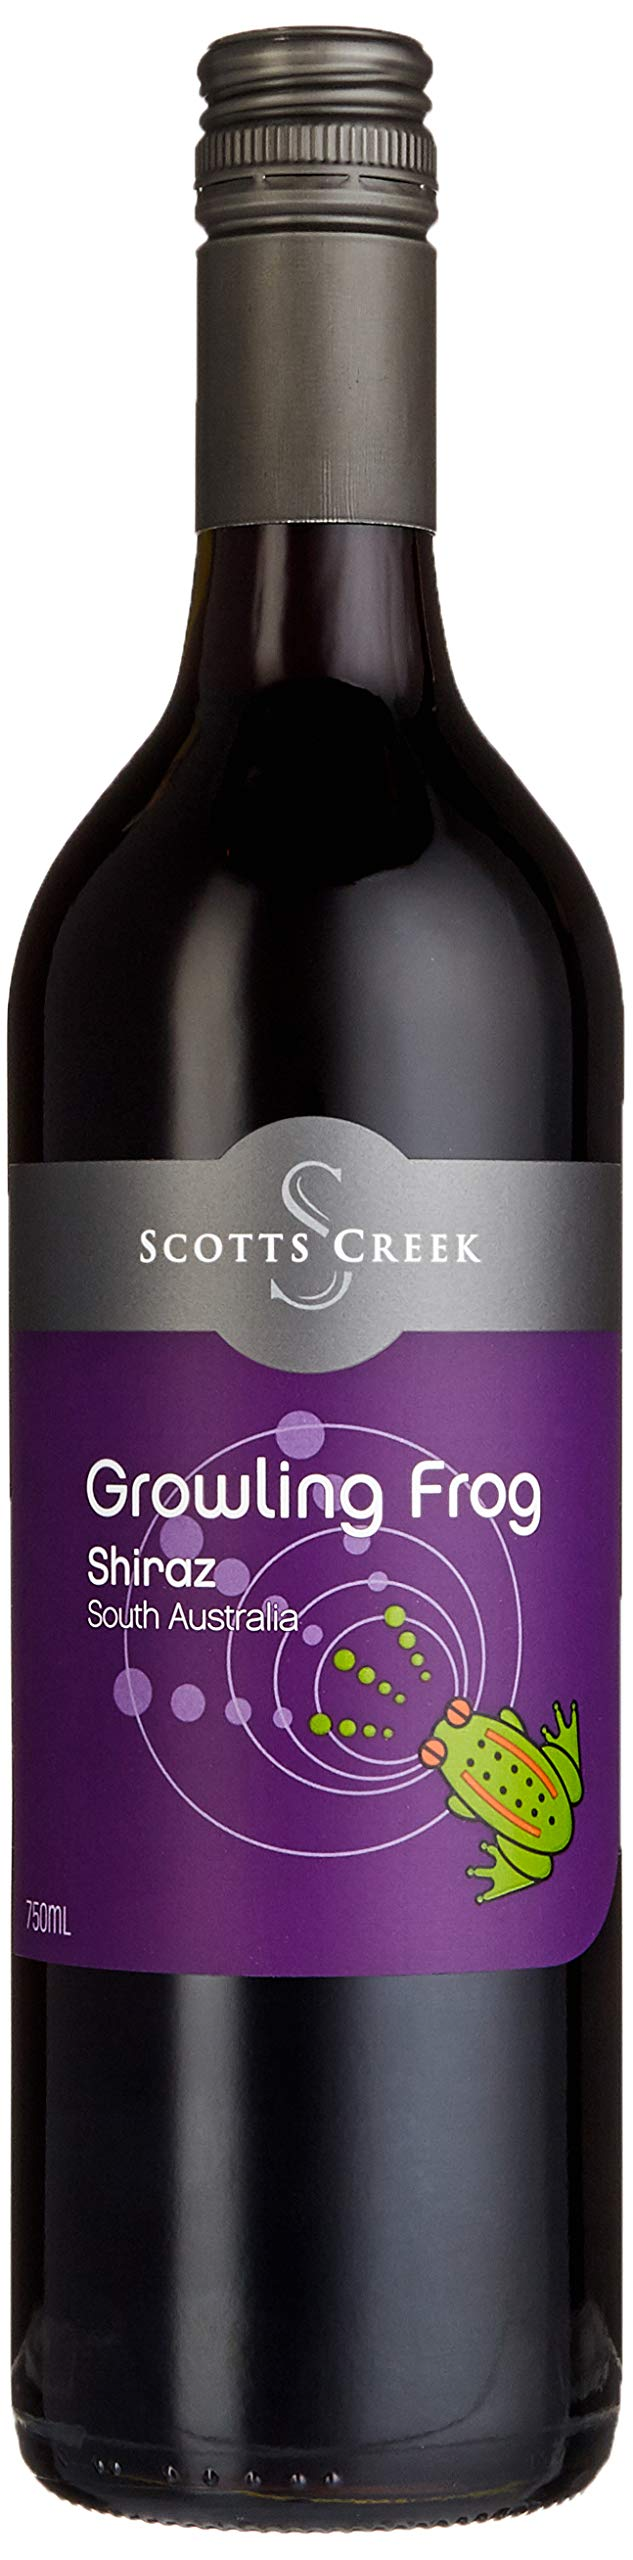 Shiraz-Growling-Frog-Scotts-Creek-2016-trocken-6-x-075l